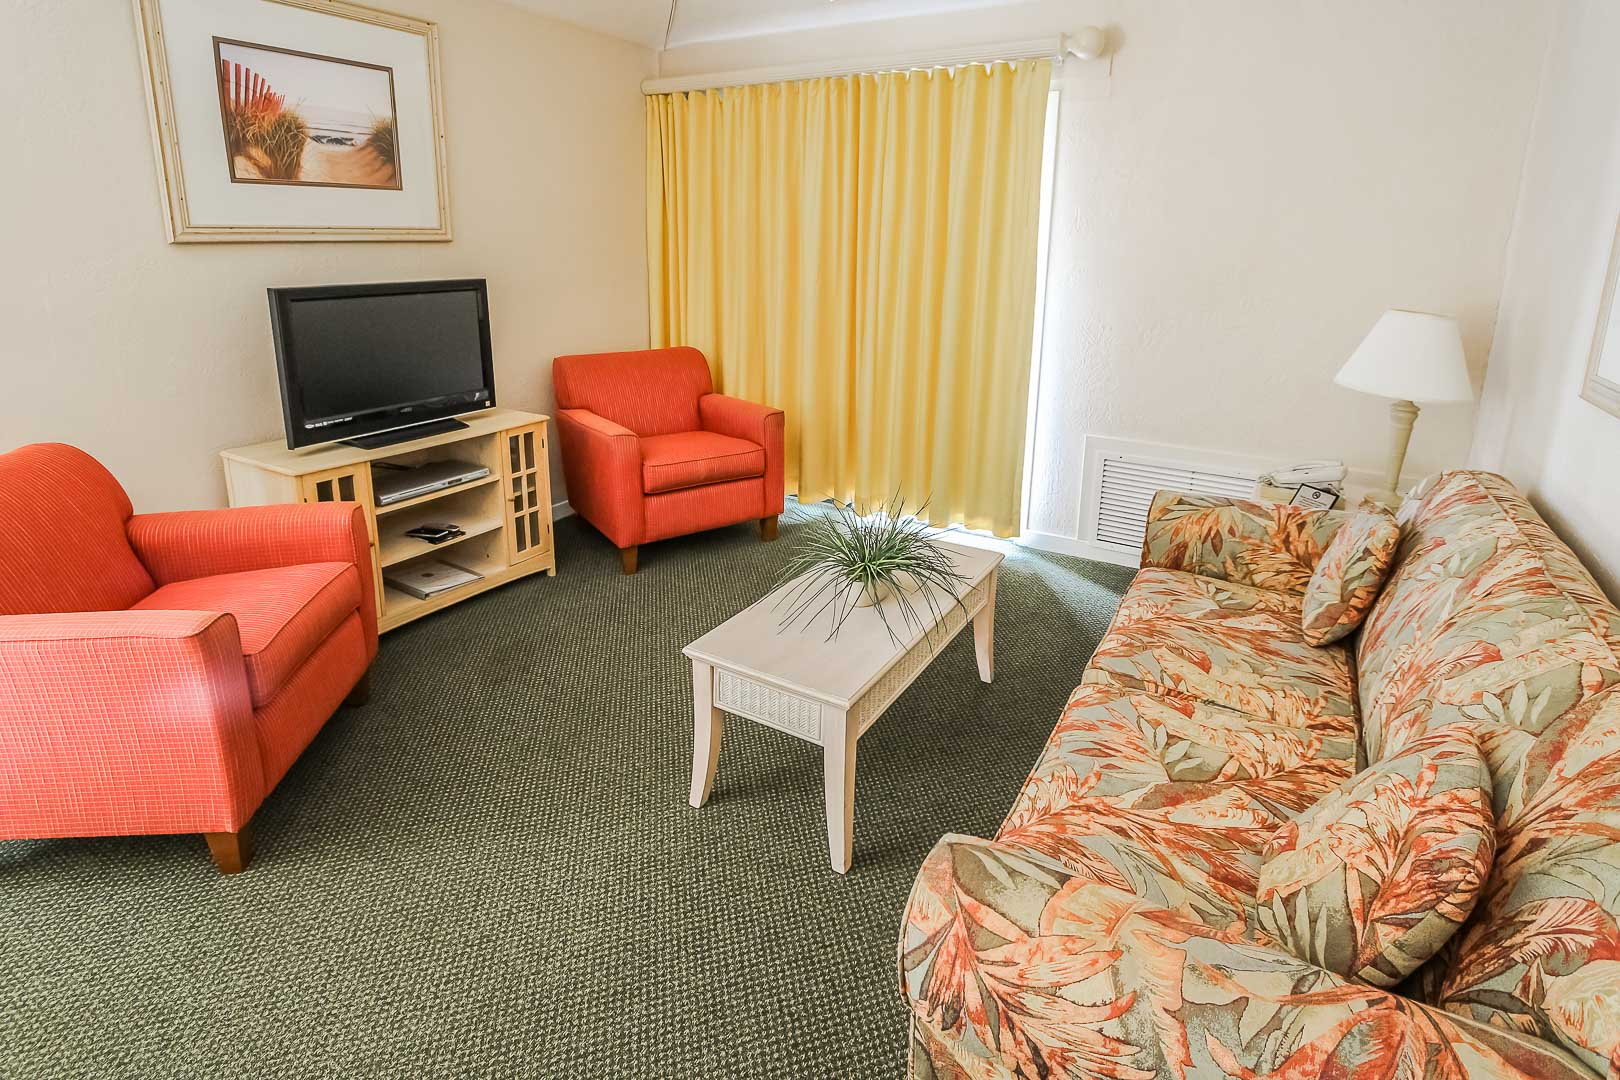 A cozy living room area at VRI's Players Club Resort in Hilton Head Island, South Carolina.